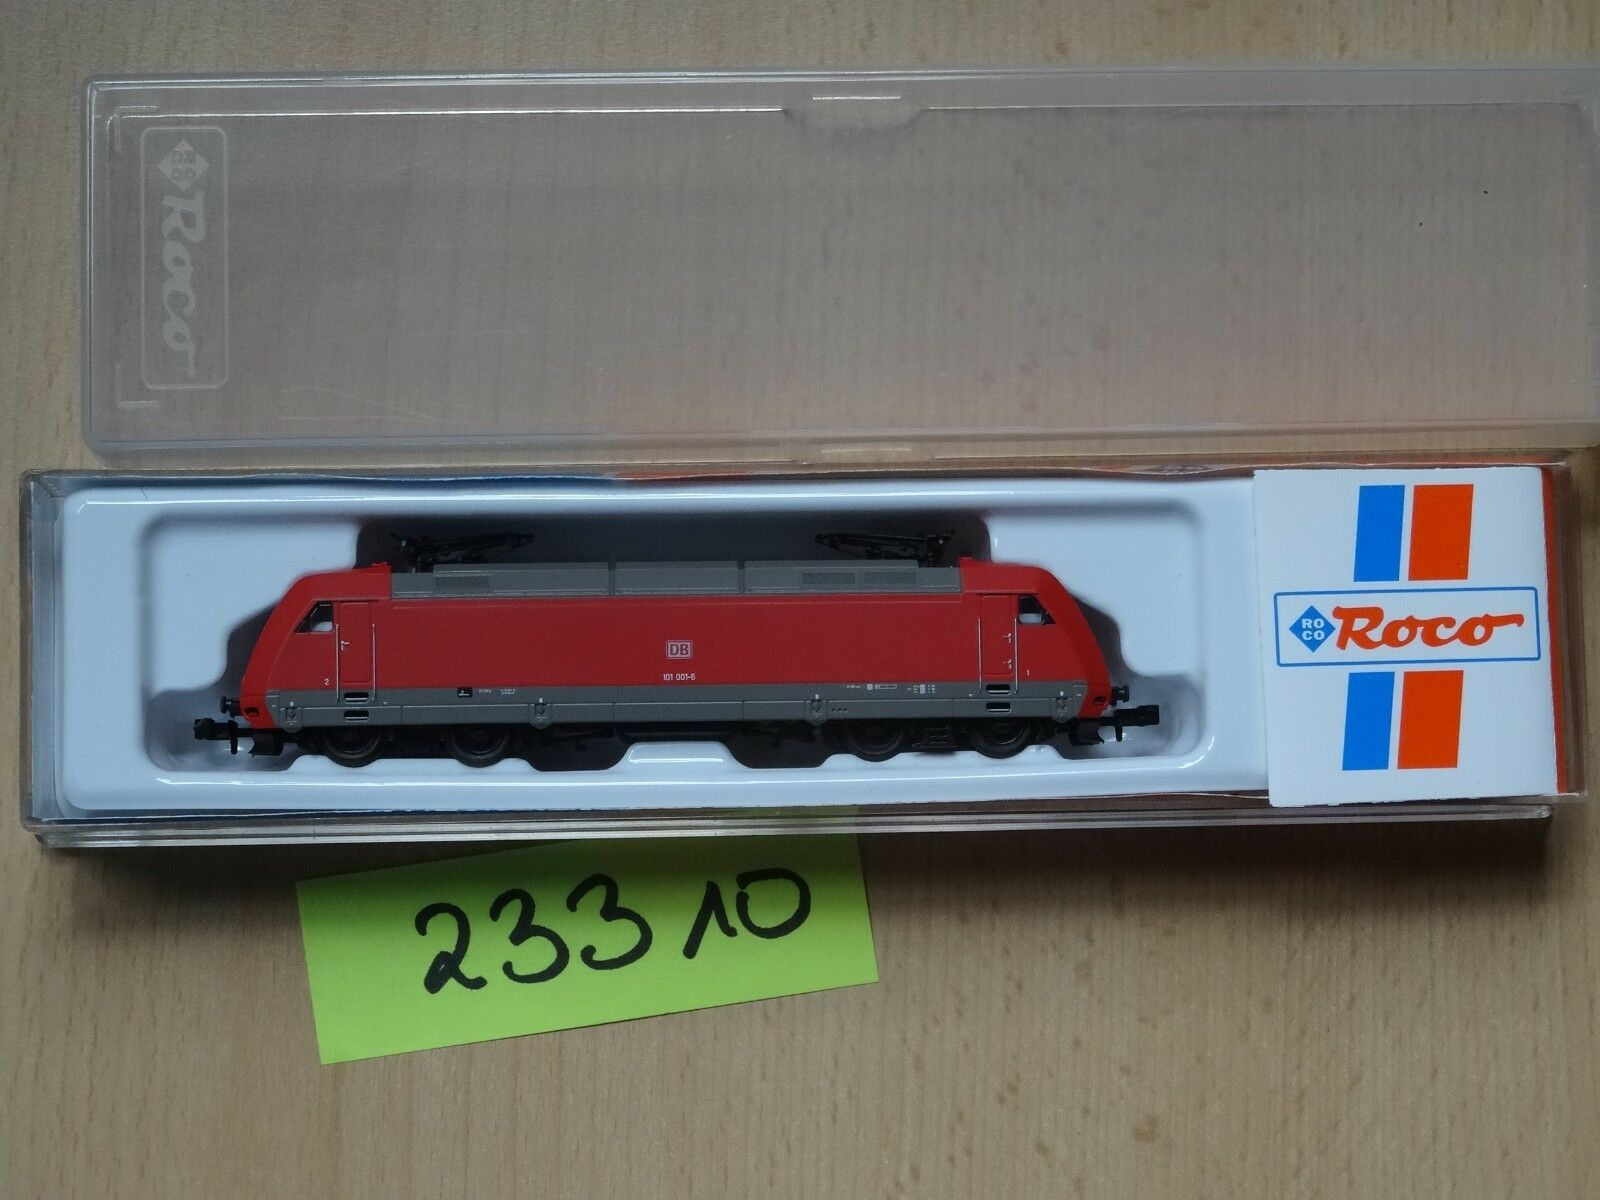 Roco N Art 23310      E-Lok BR  1011 001 der DB    Neuware OVP 23f20c